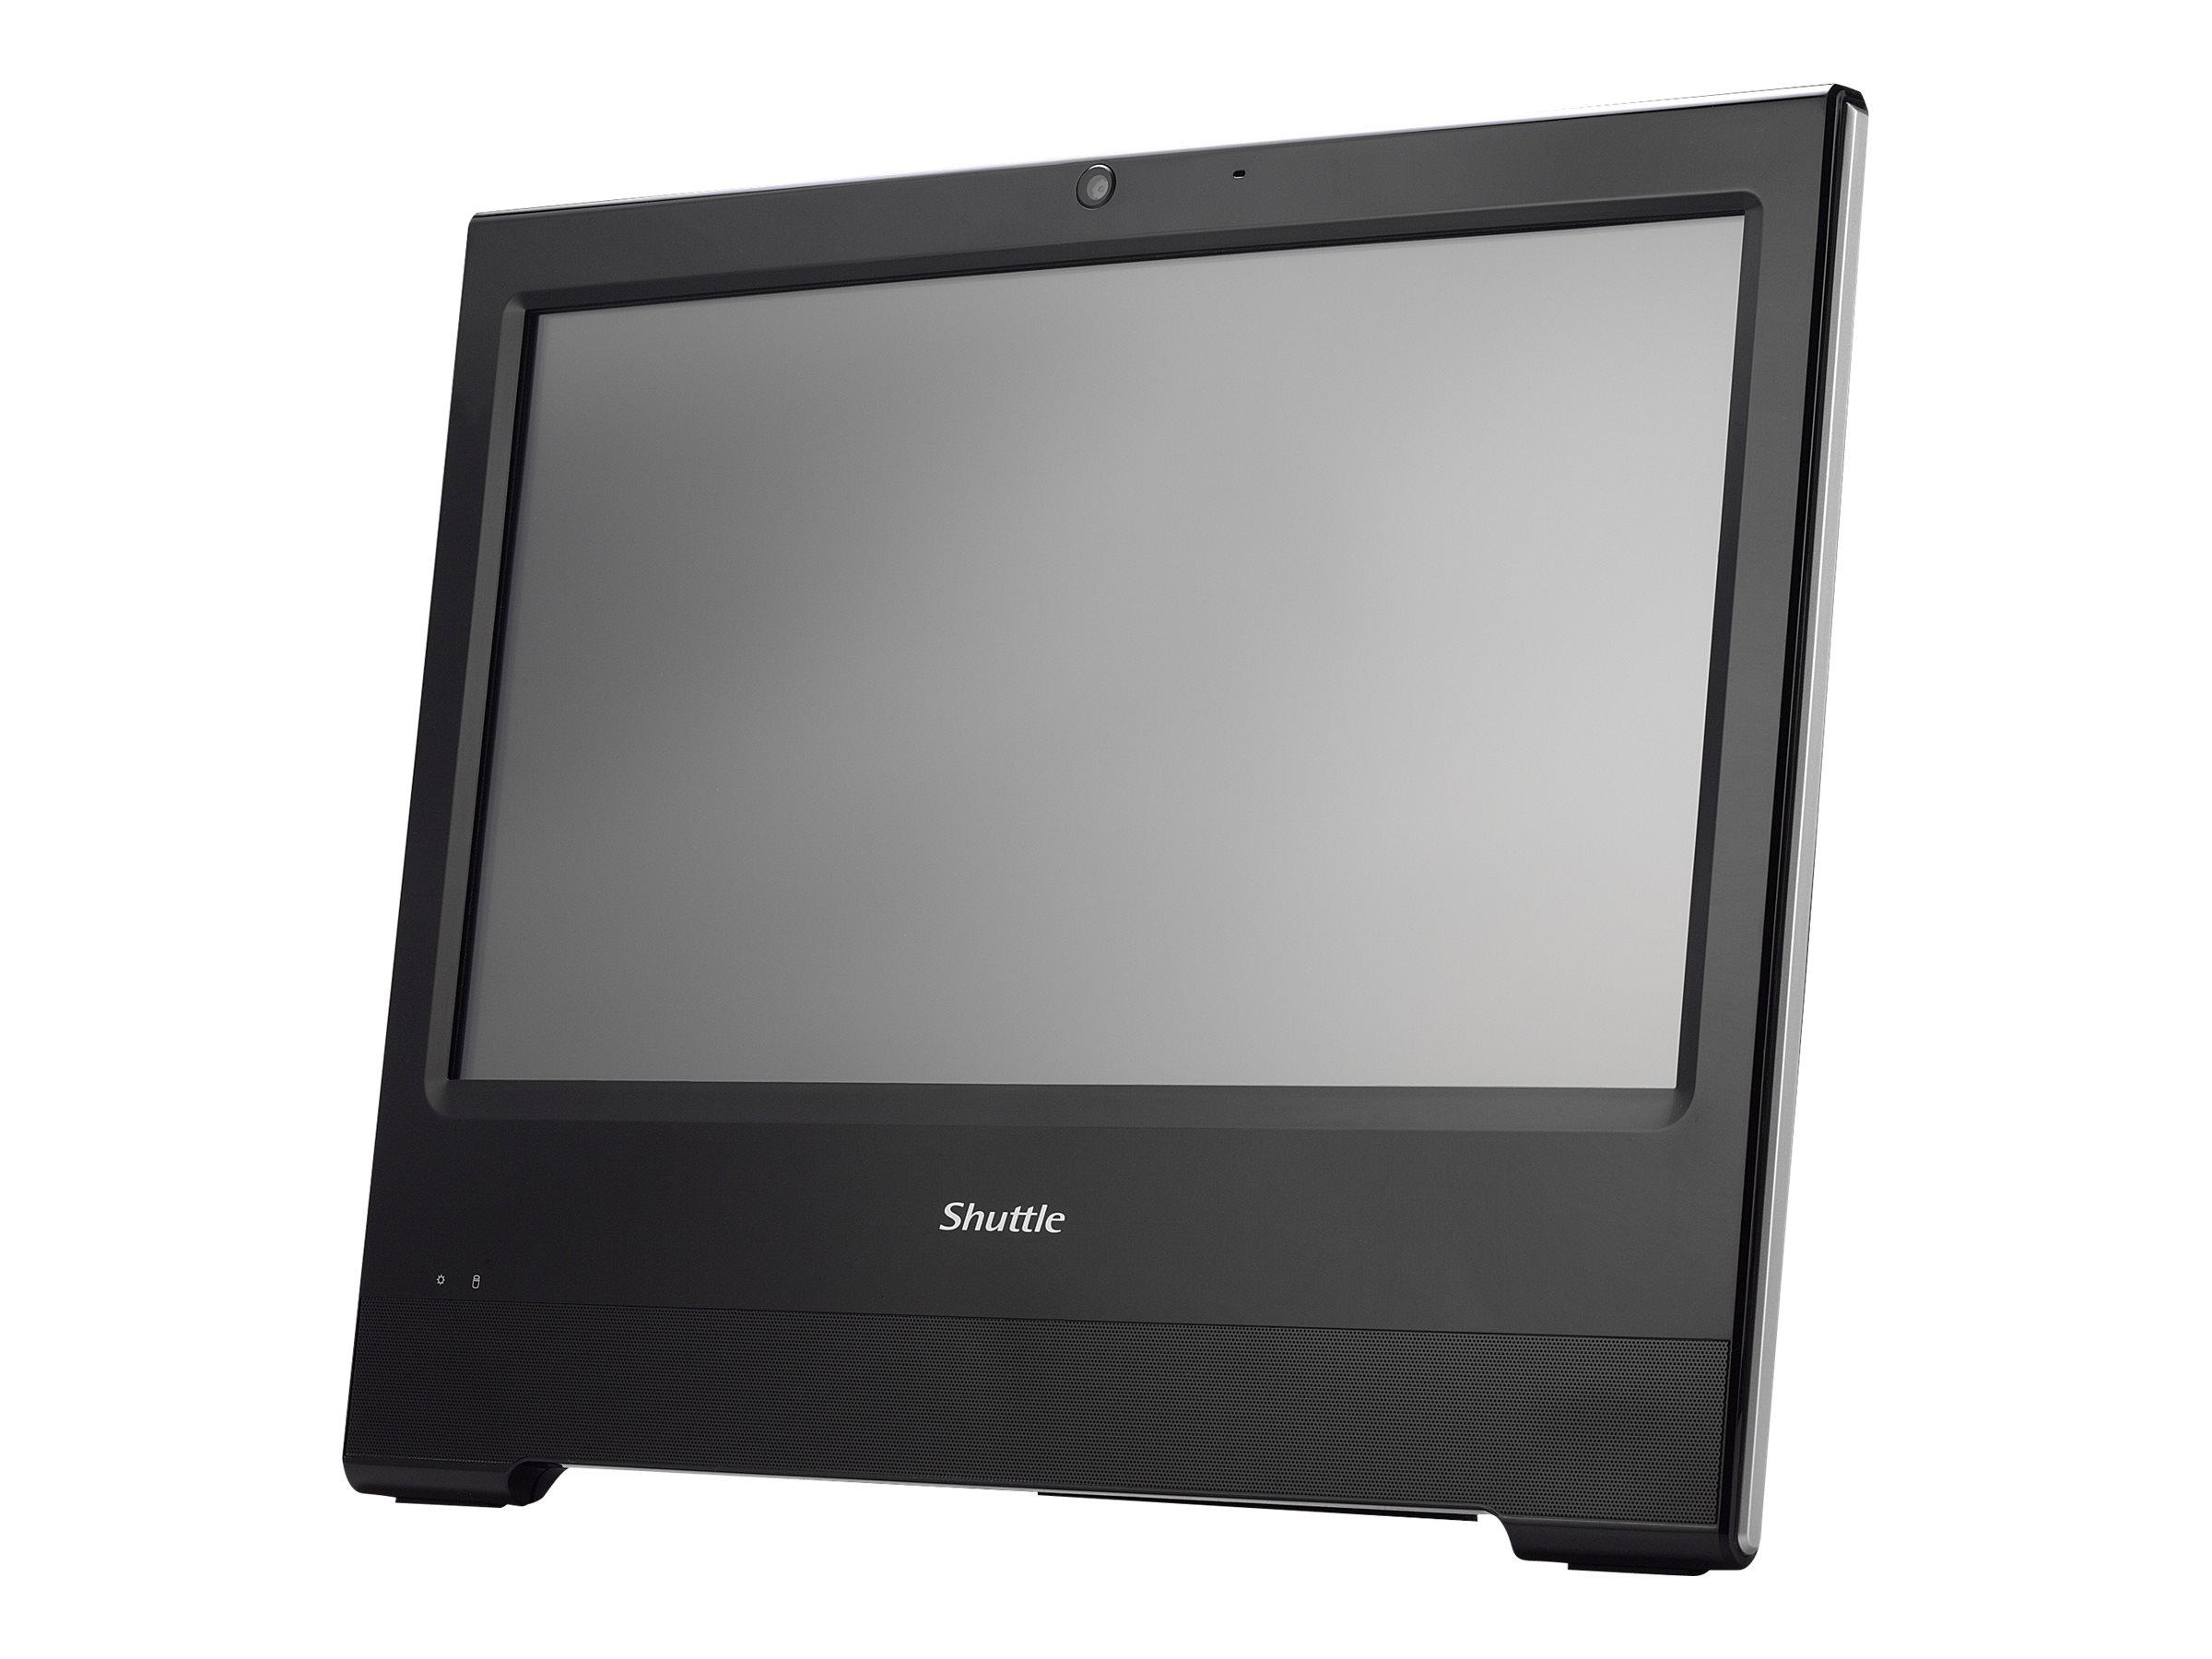 Shuttle XPC X5060TA - All-in-One (Komplettlösung) - 1 x Celeron 3865U / 1.8 GHz ULV - RAM 4 GB - HDD 500 GB - HD Graphics 610